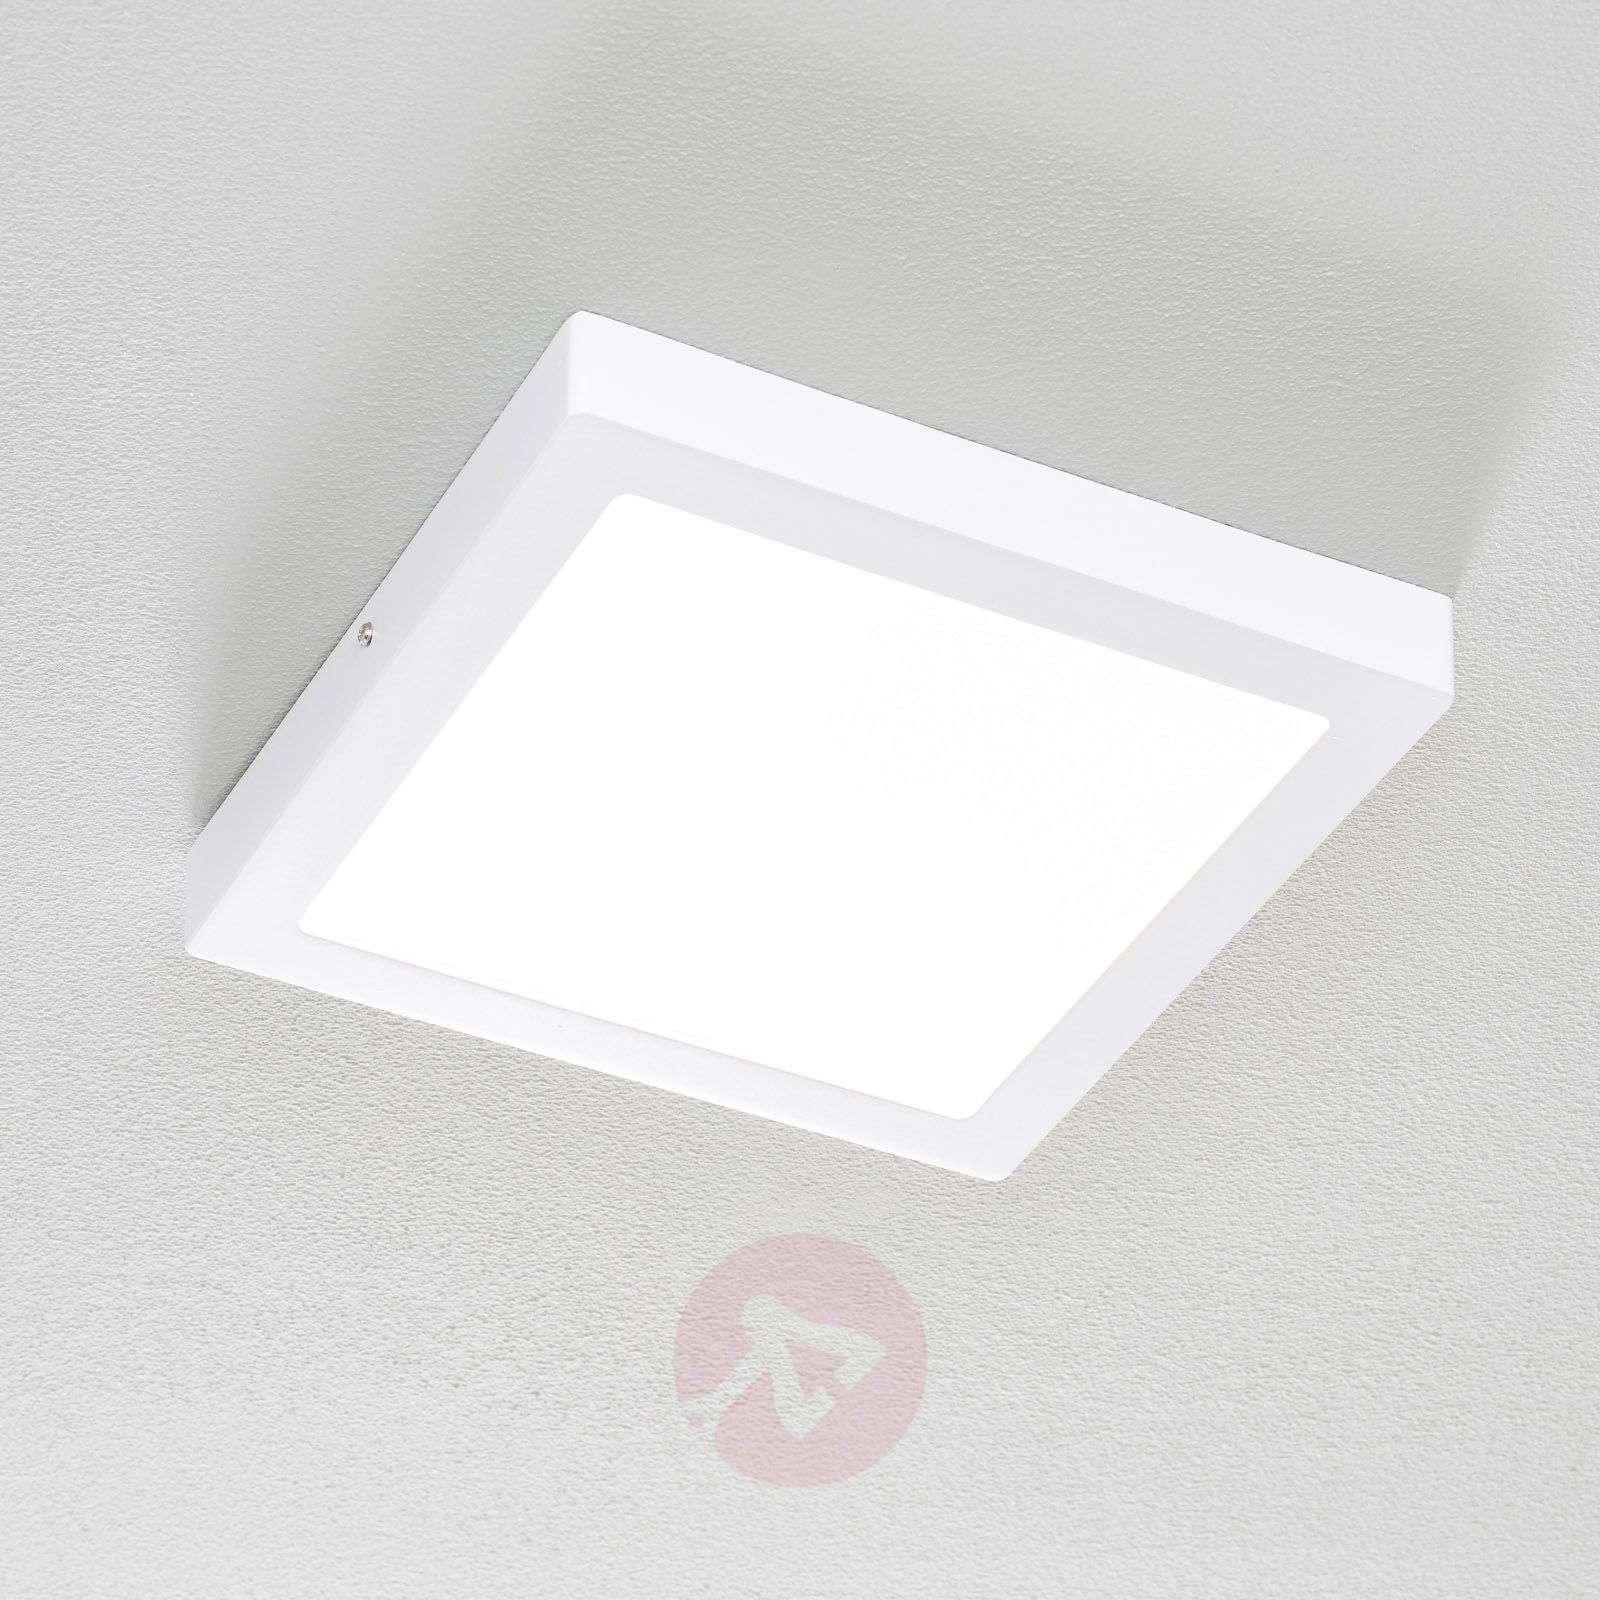 Fueva Connect-LED-kattovalaisin 30 cm, valk.-3032065-01